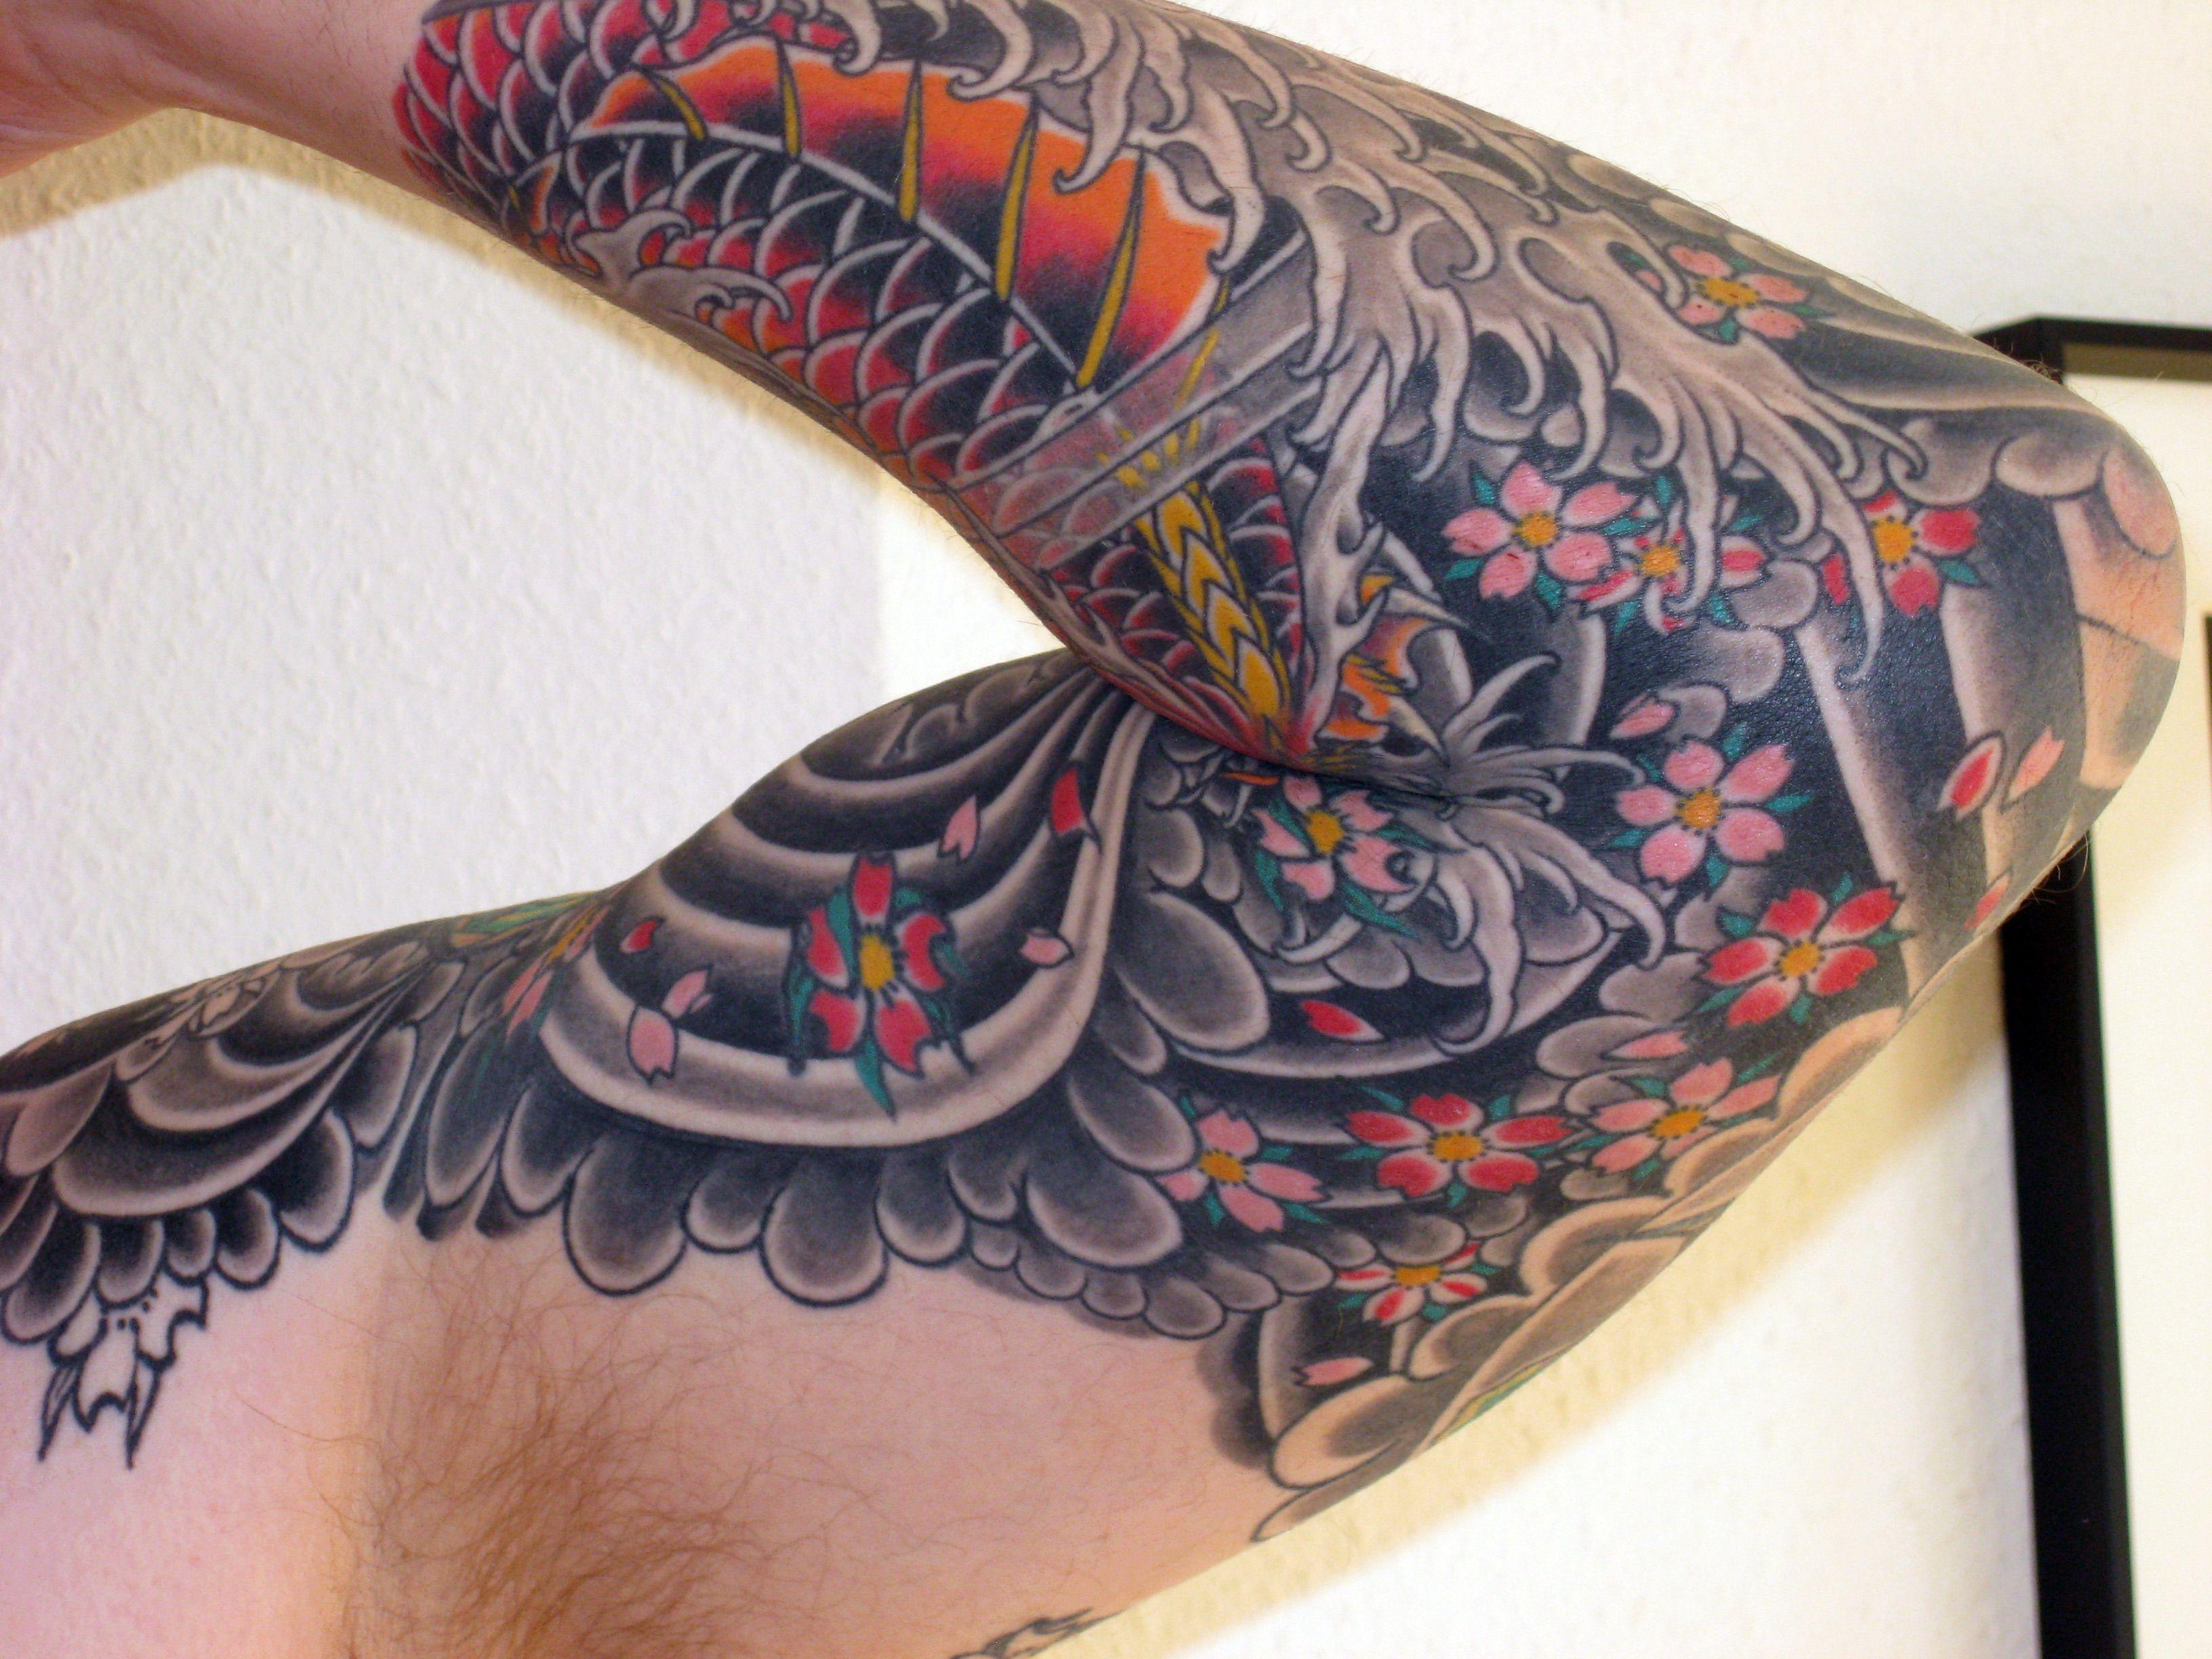 Japanese sleeve tattoos designs and ideas - Japanese Sleeve Tattoos The Coolest Japanese Tattoo Designs For Men Japanese Tattoo